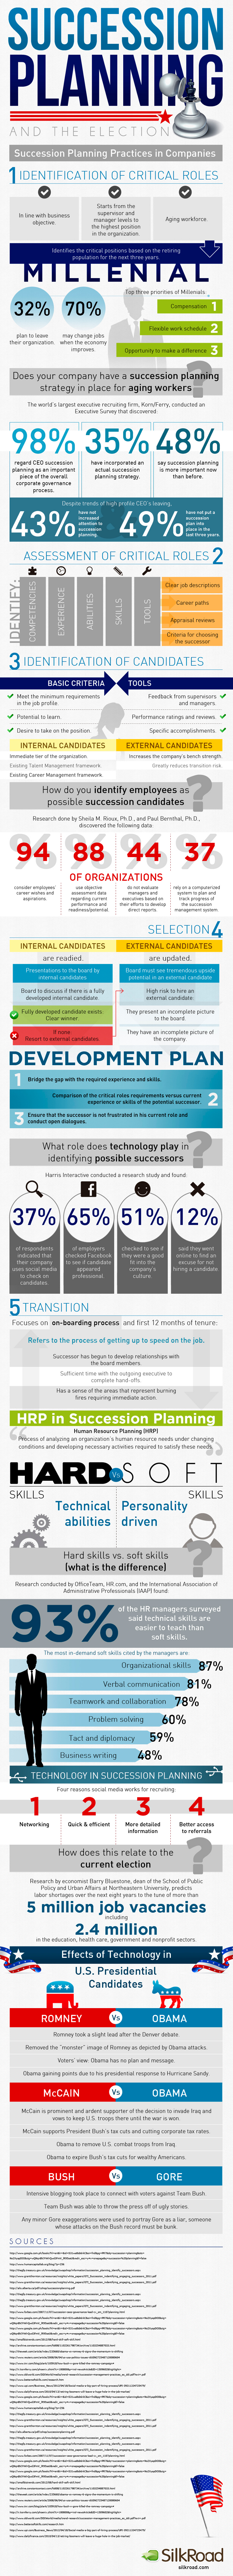 Success Planning Trends